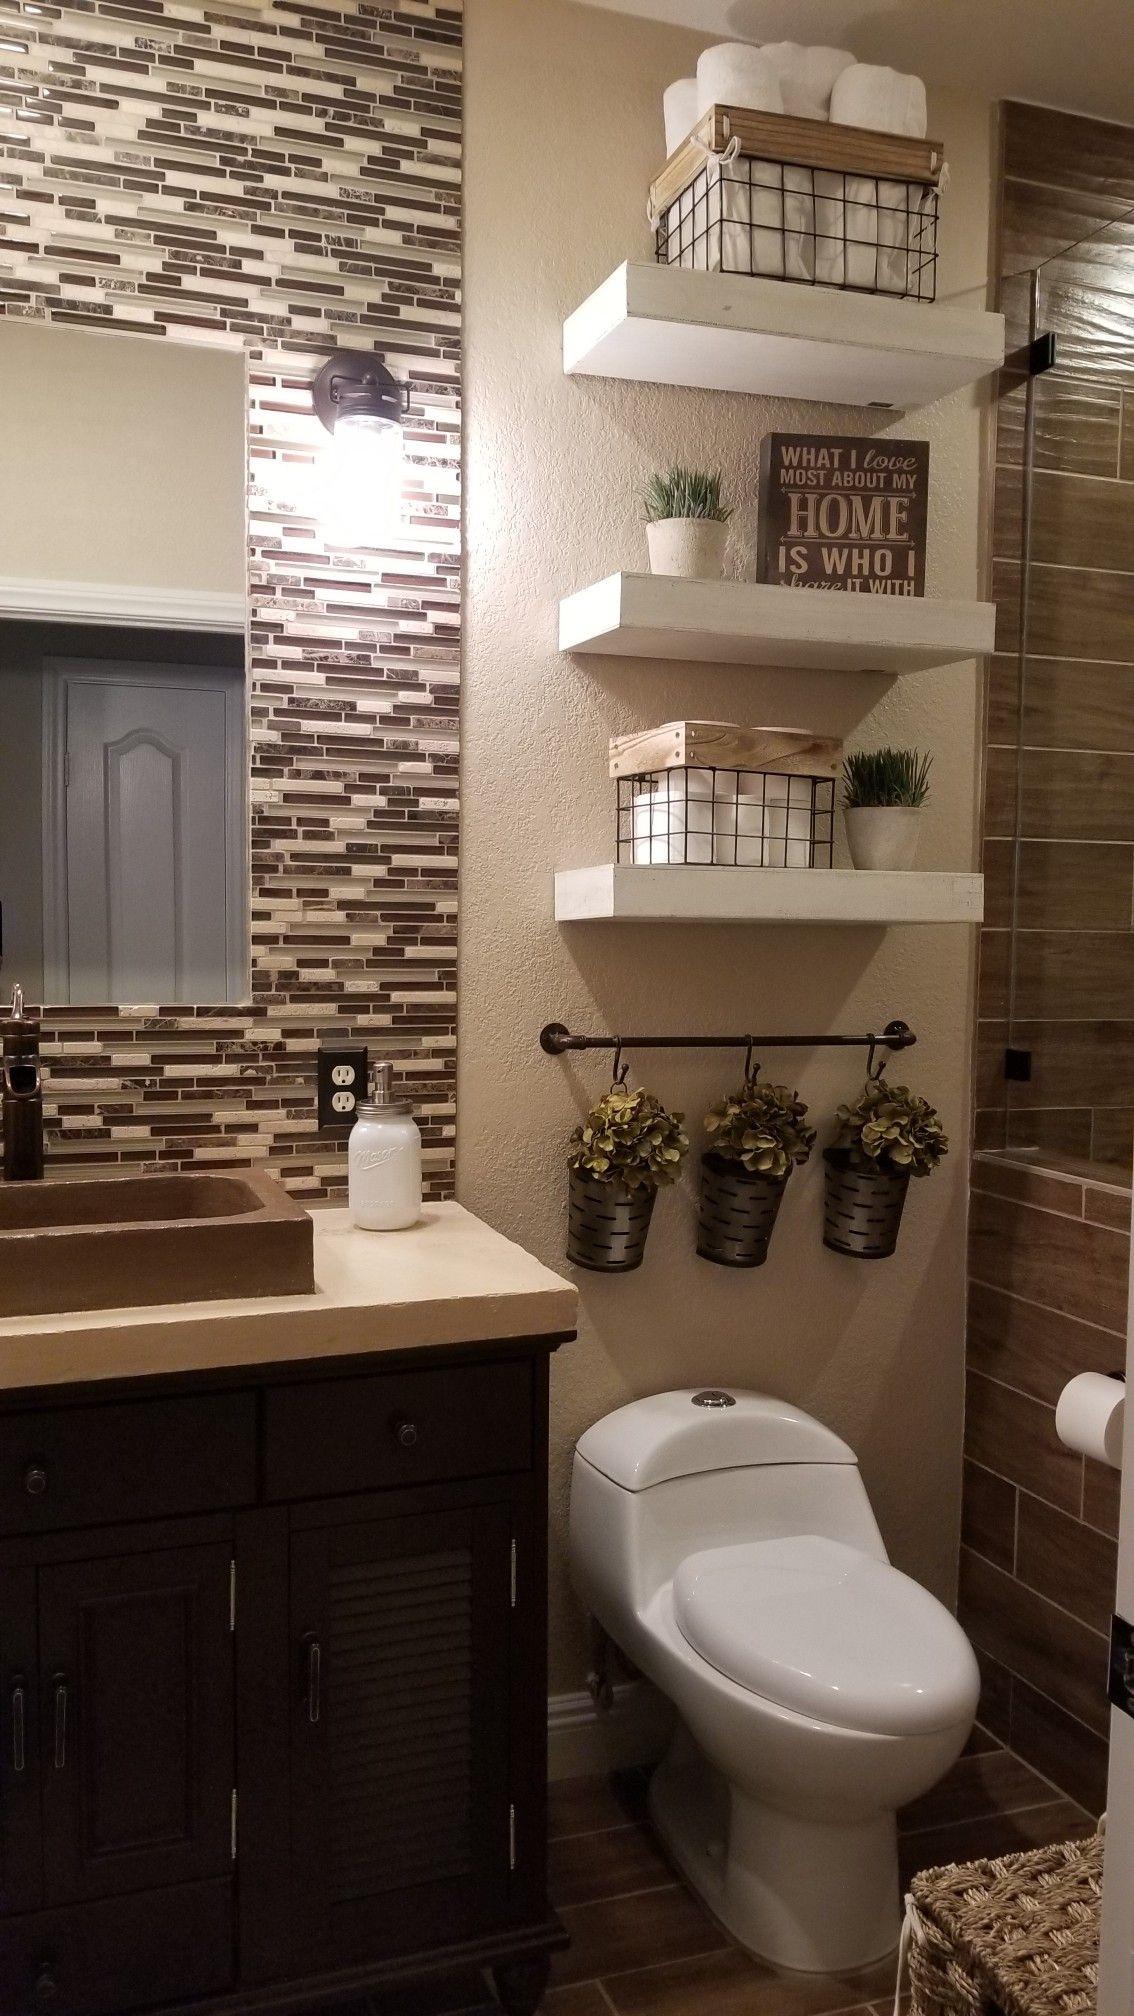 Guest Bathroom Decor Decoracao Banheiro Decoracao De Banheiro Simples Decoracao Do Banheiro